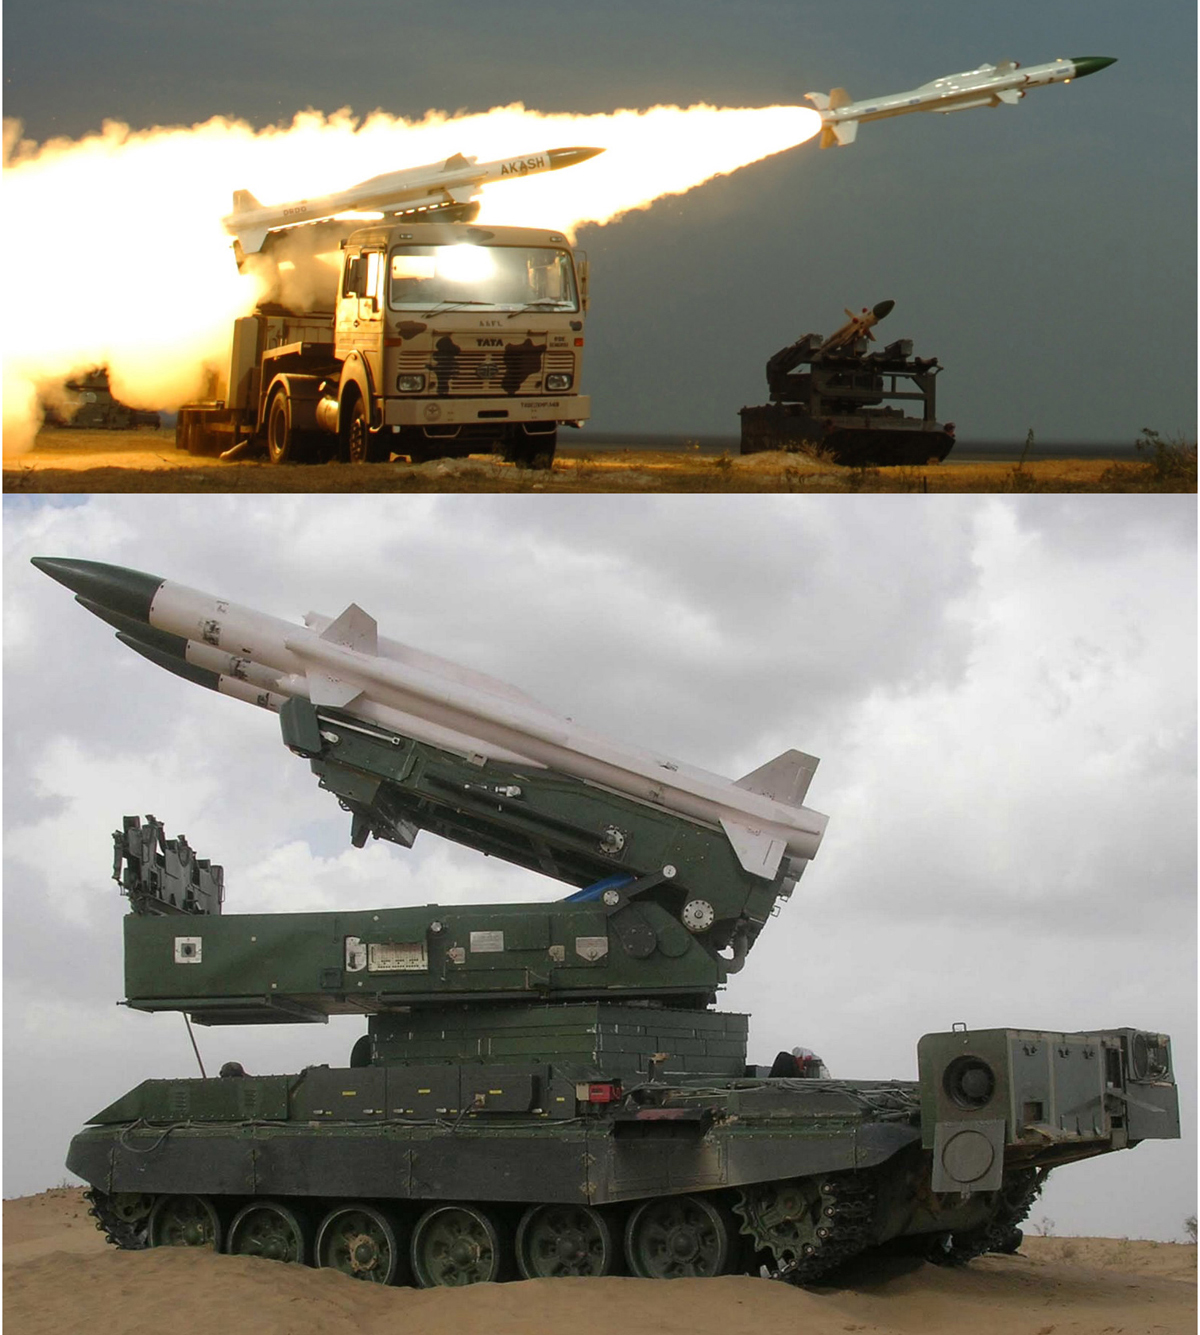 EJERCITO INDIO Akash+Mk1+E-SHORADS+for+IAF+%2528above%2529+%2526+Army